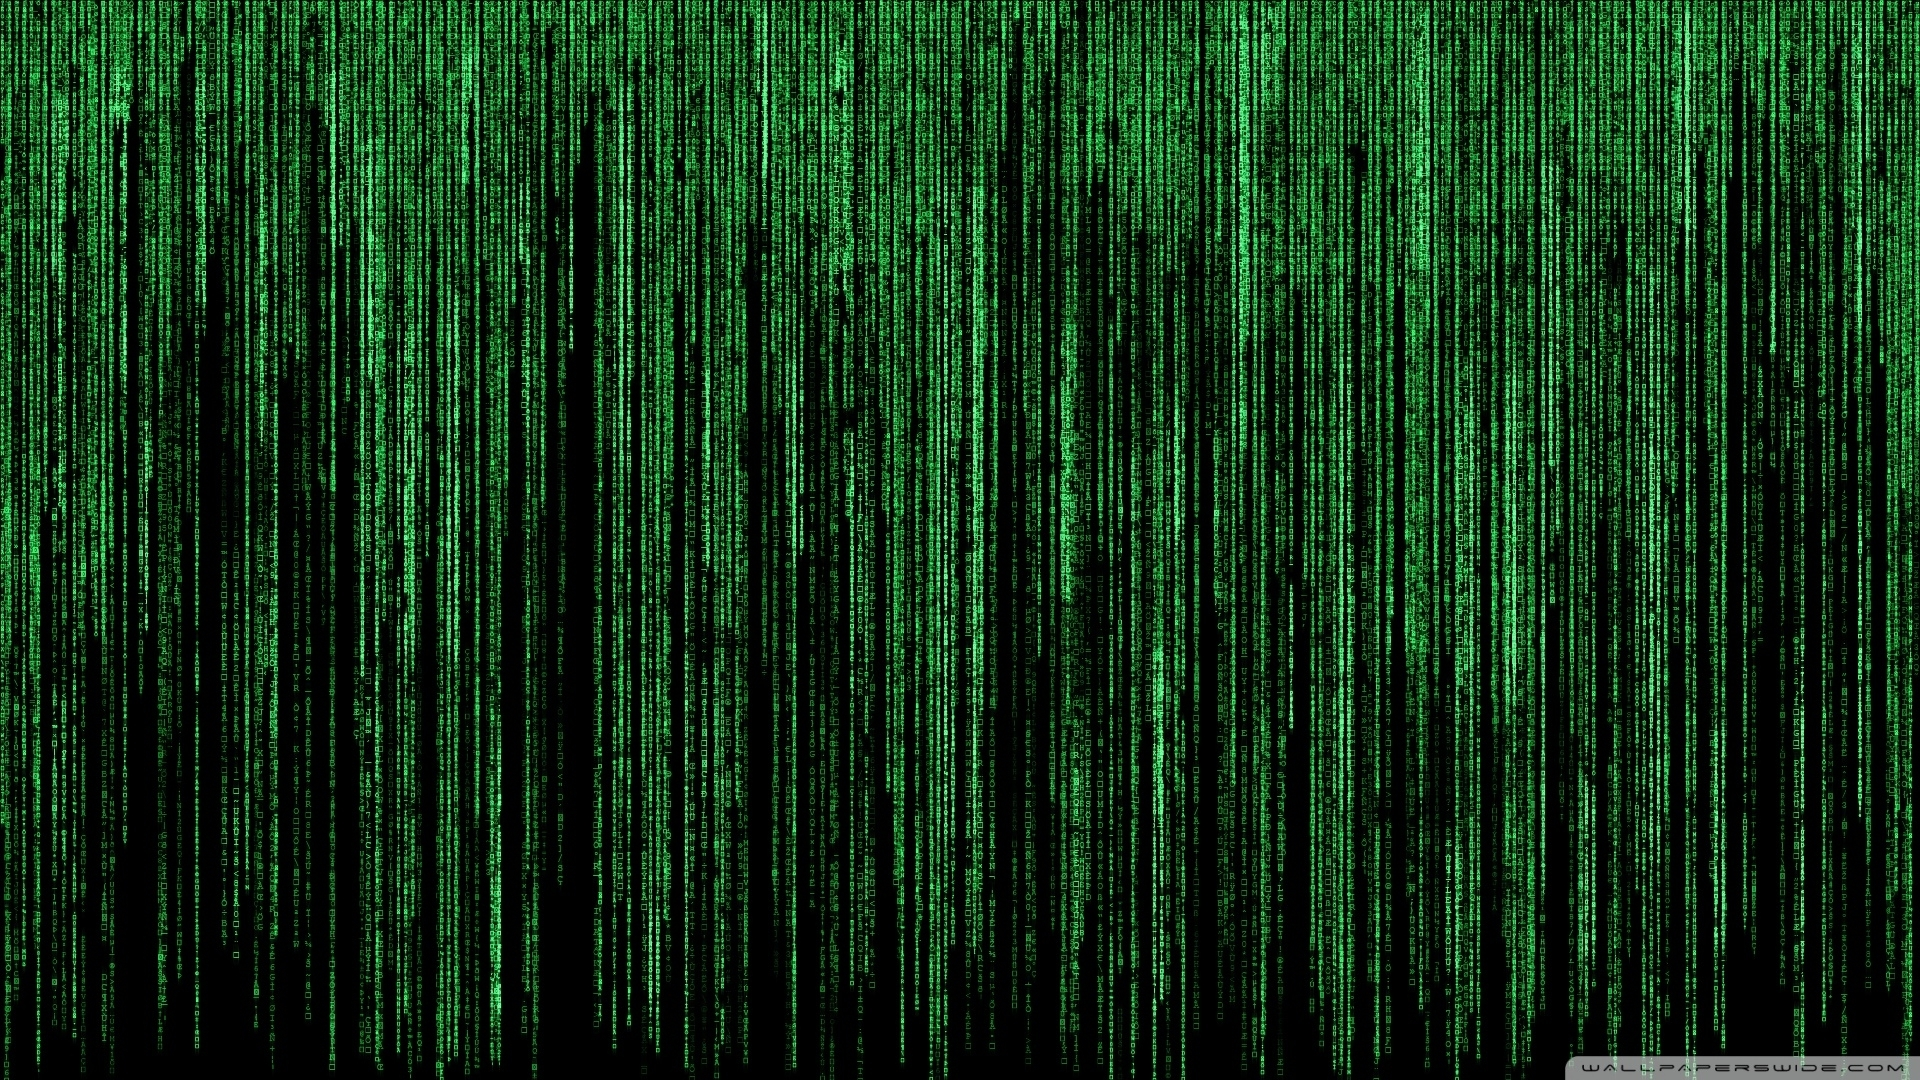 matrix ❤ 4k hd desktop wallpaper for 4k ultra hd tv • wide & ultra